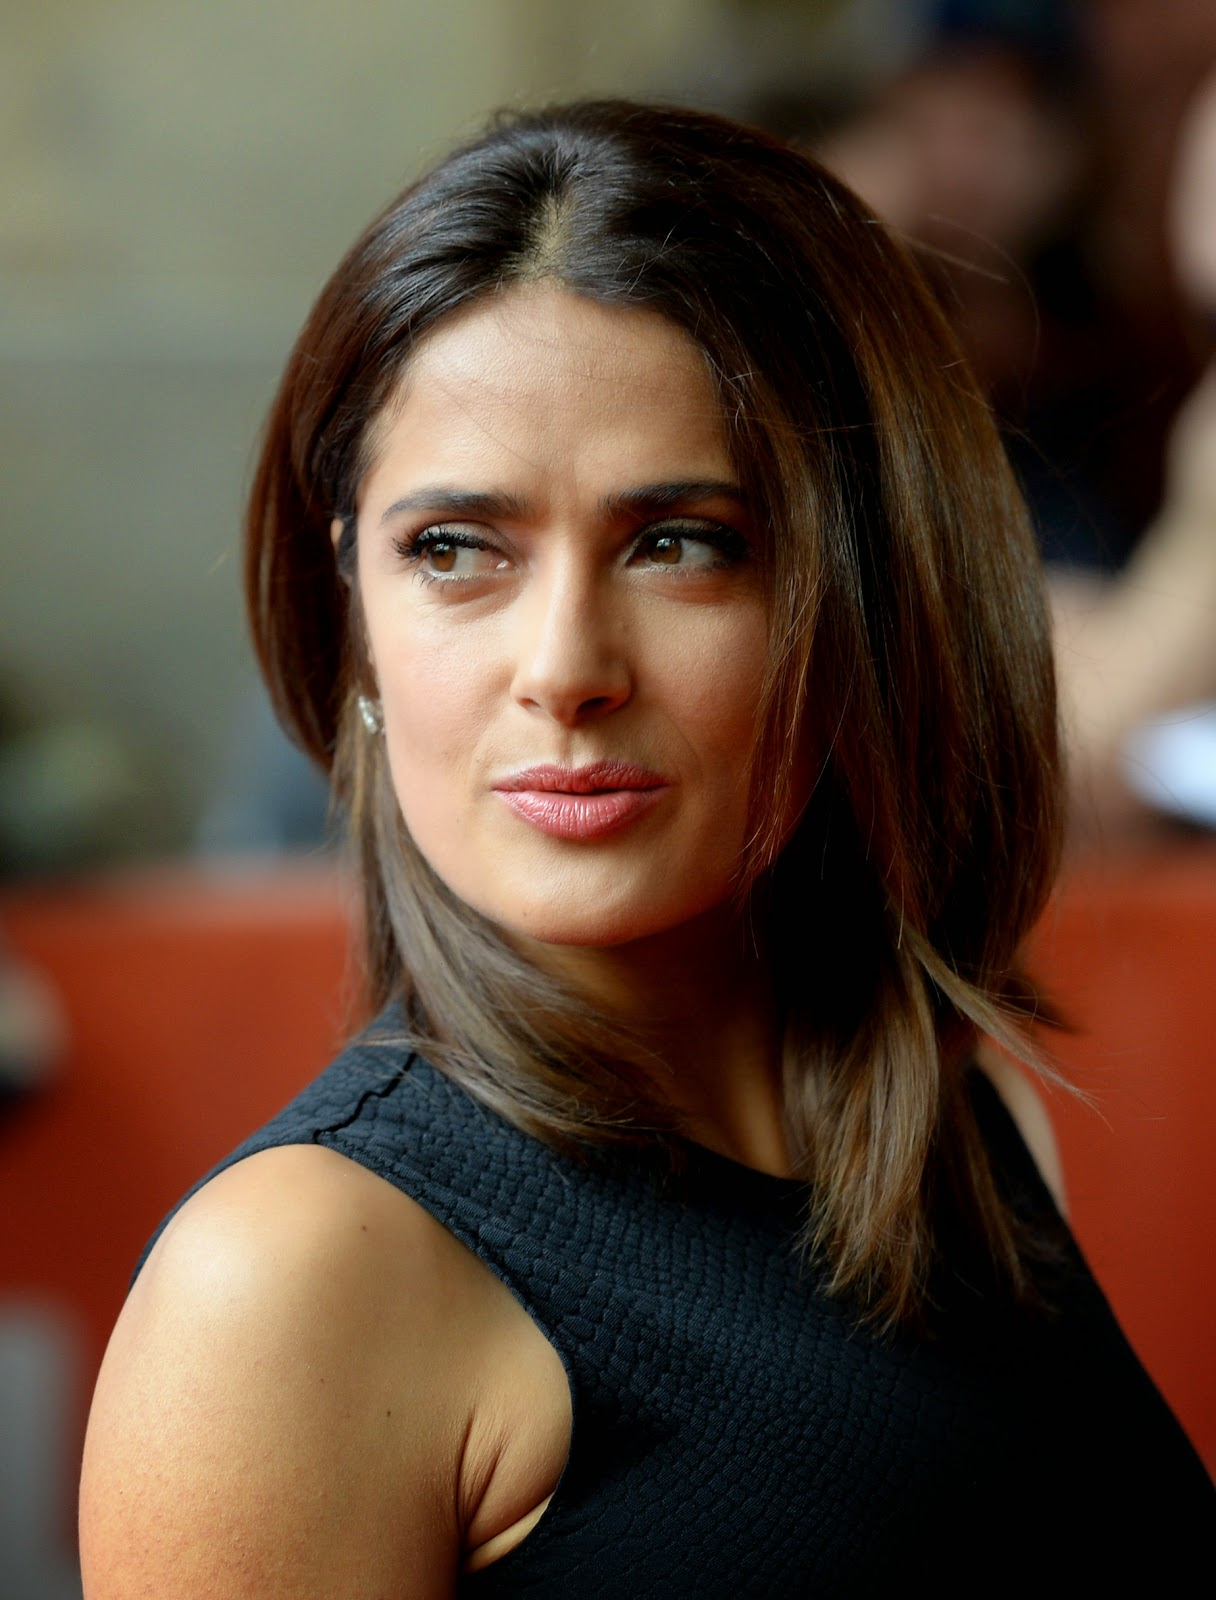 Salma Hayek HD Pictures | HD Wallpapers of Salma Hayek